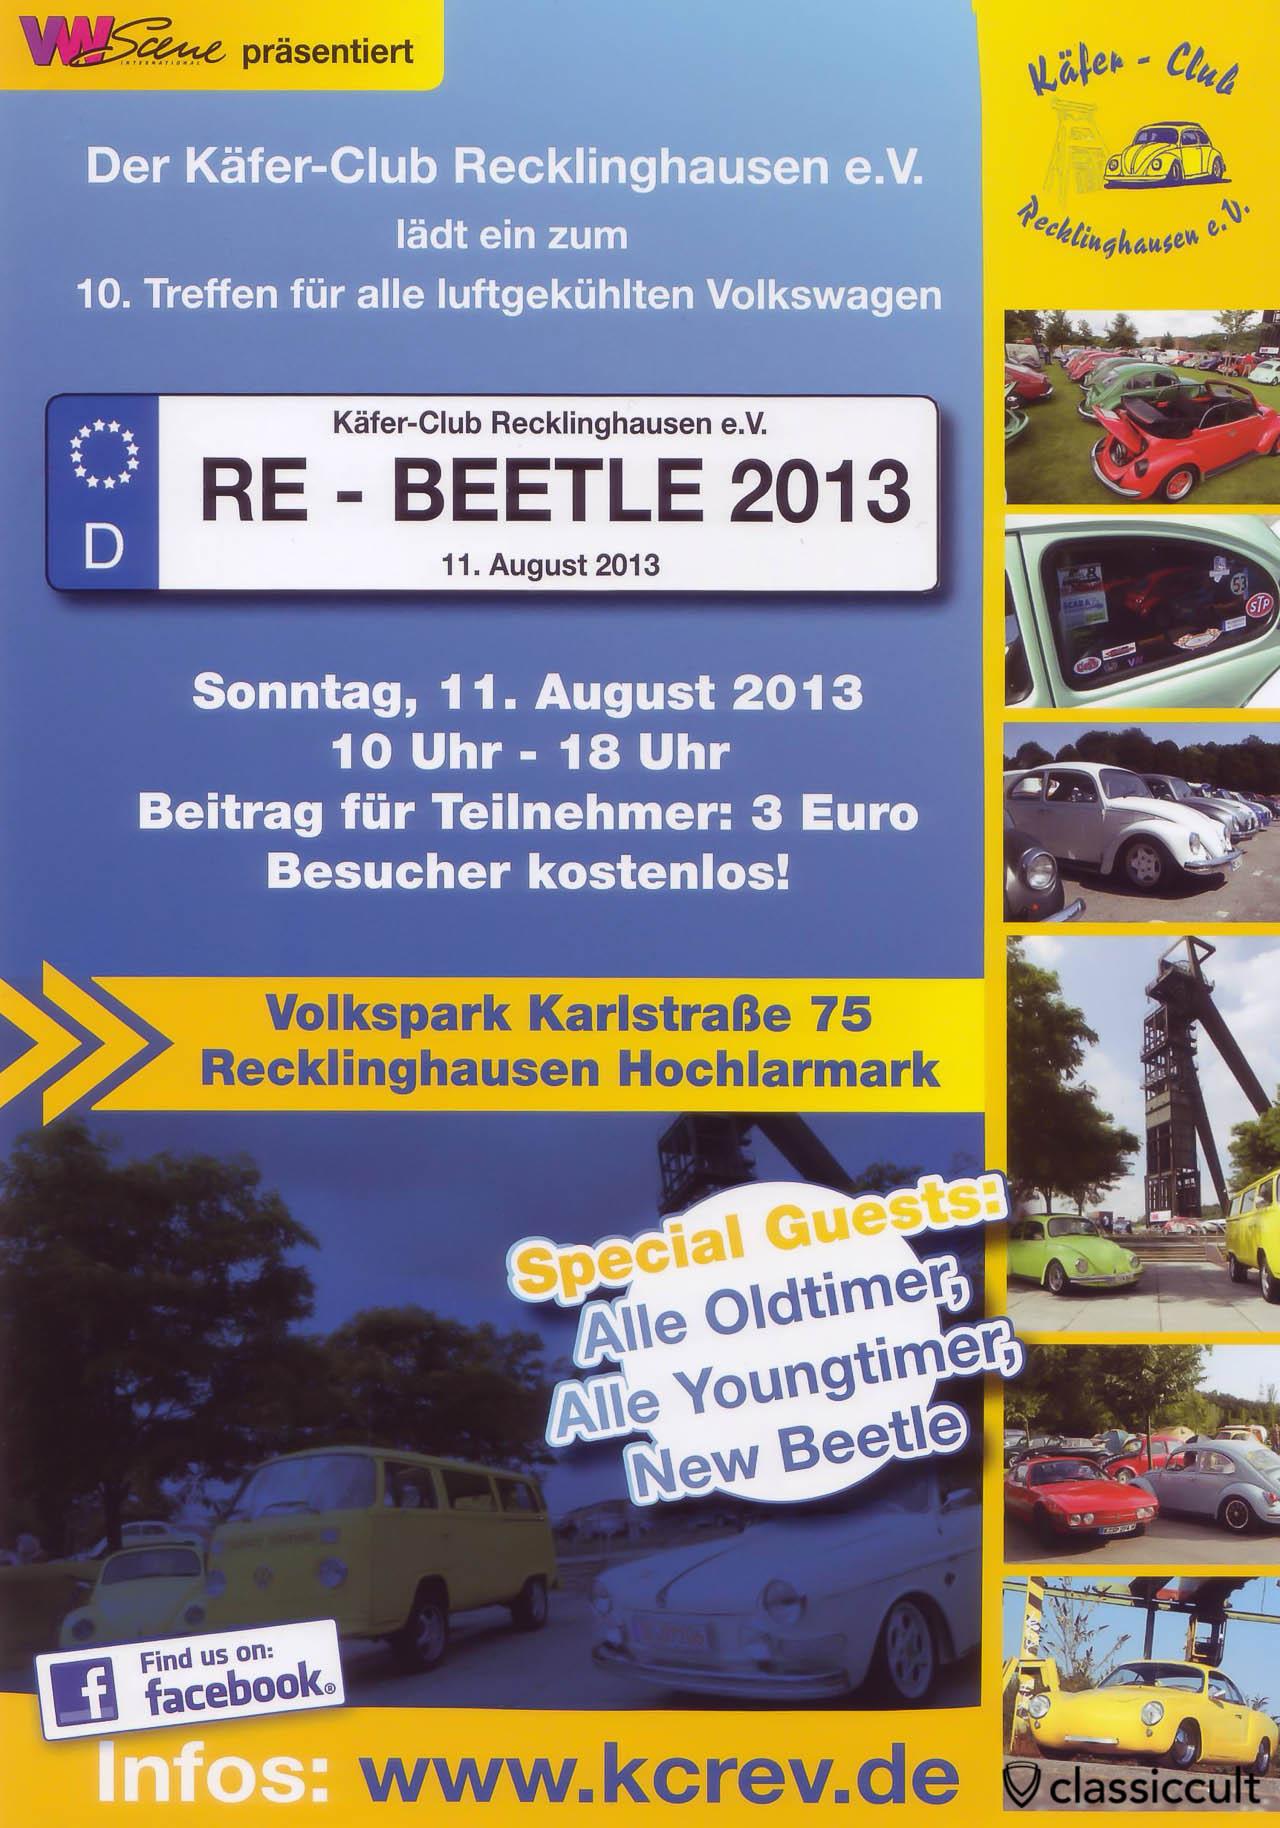 VW Käfer Club Recklinghausen VW Treffen 11.08.2013 Flyer